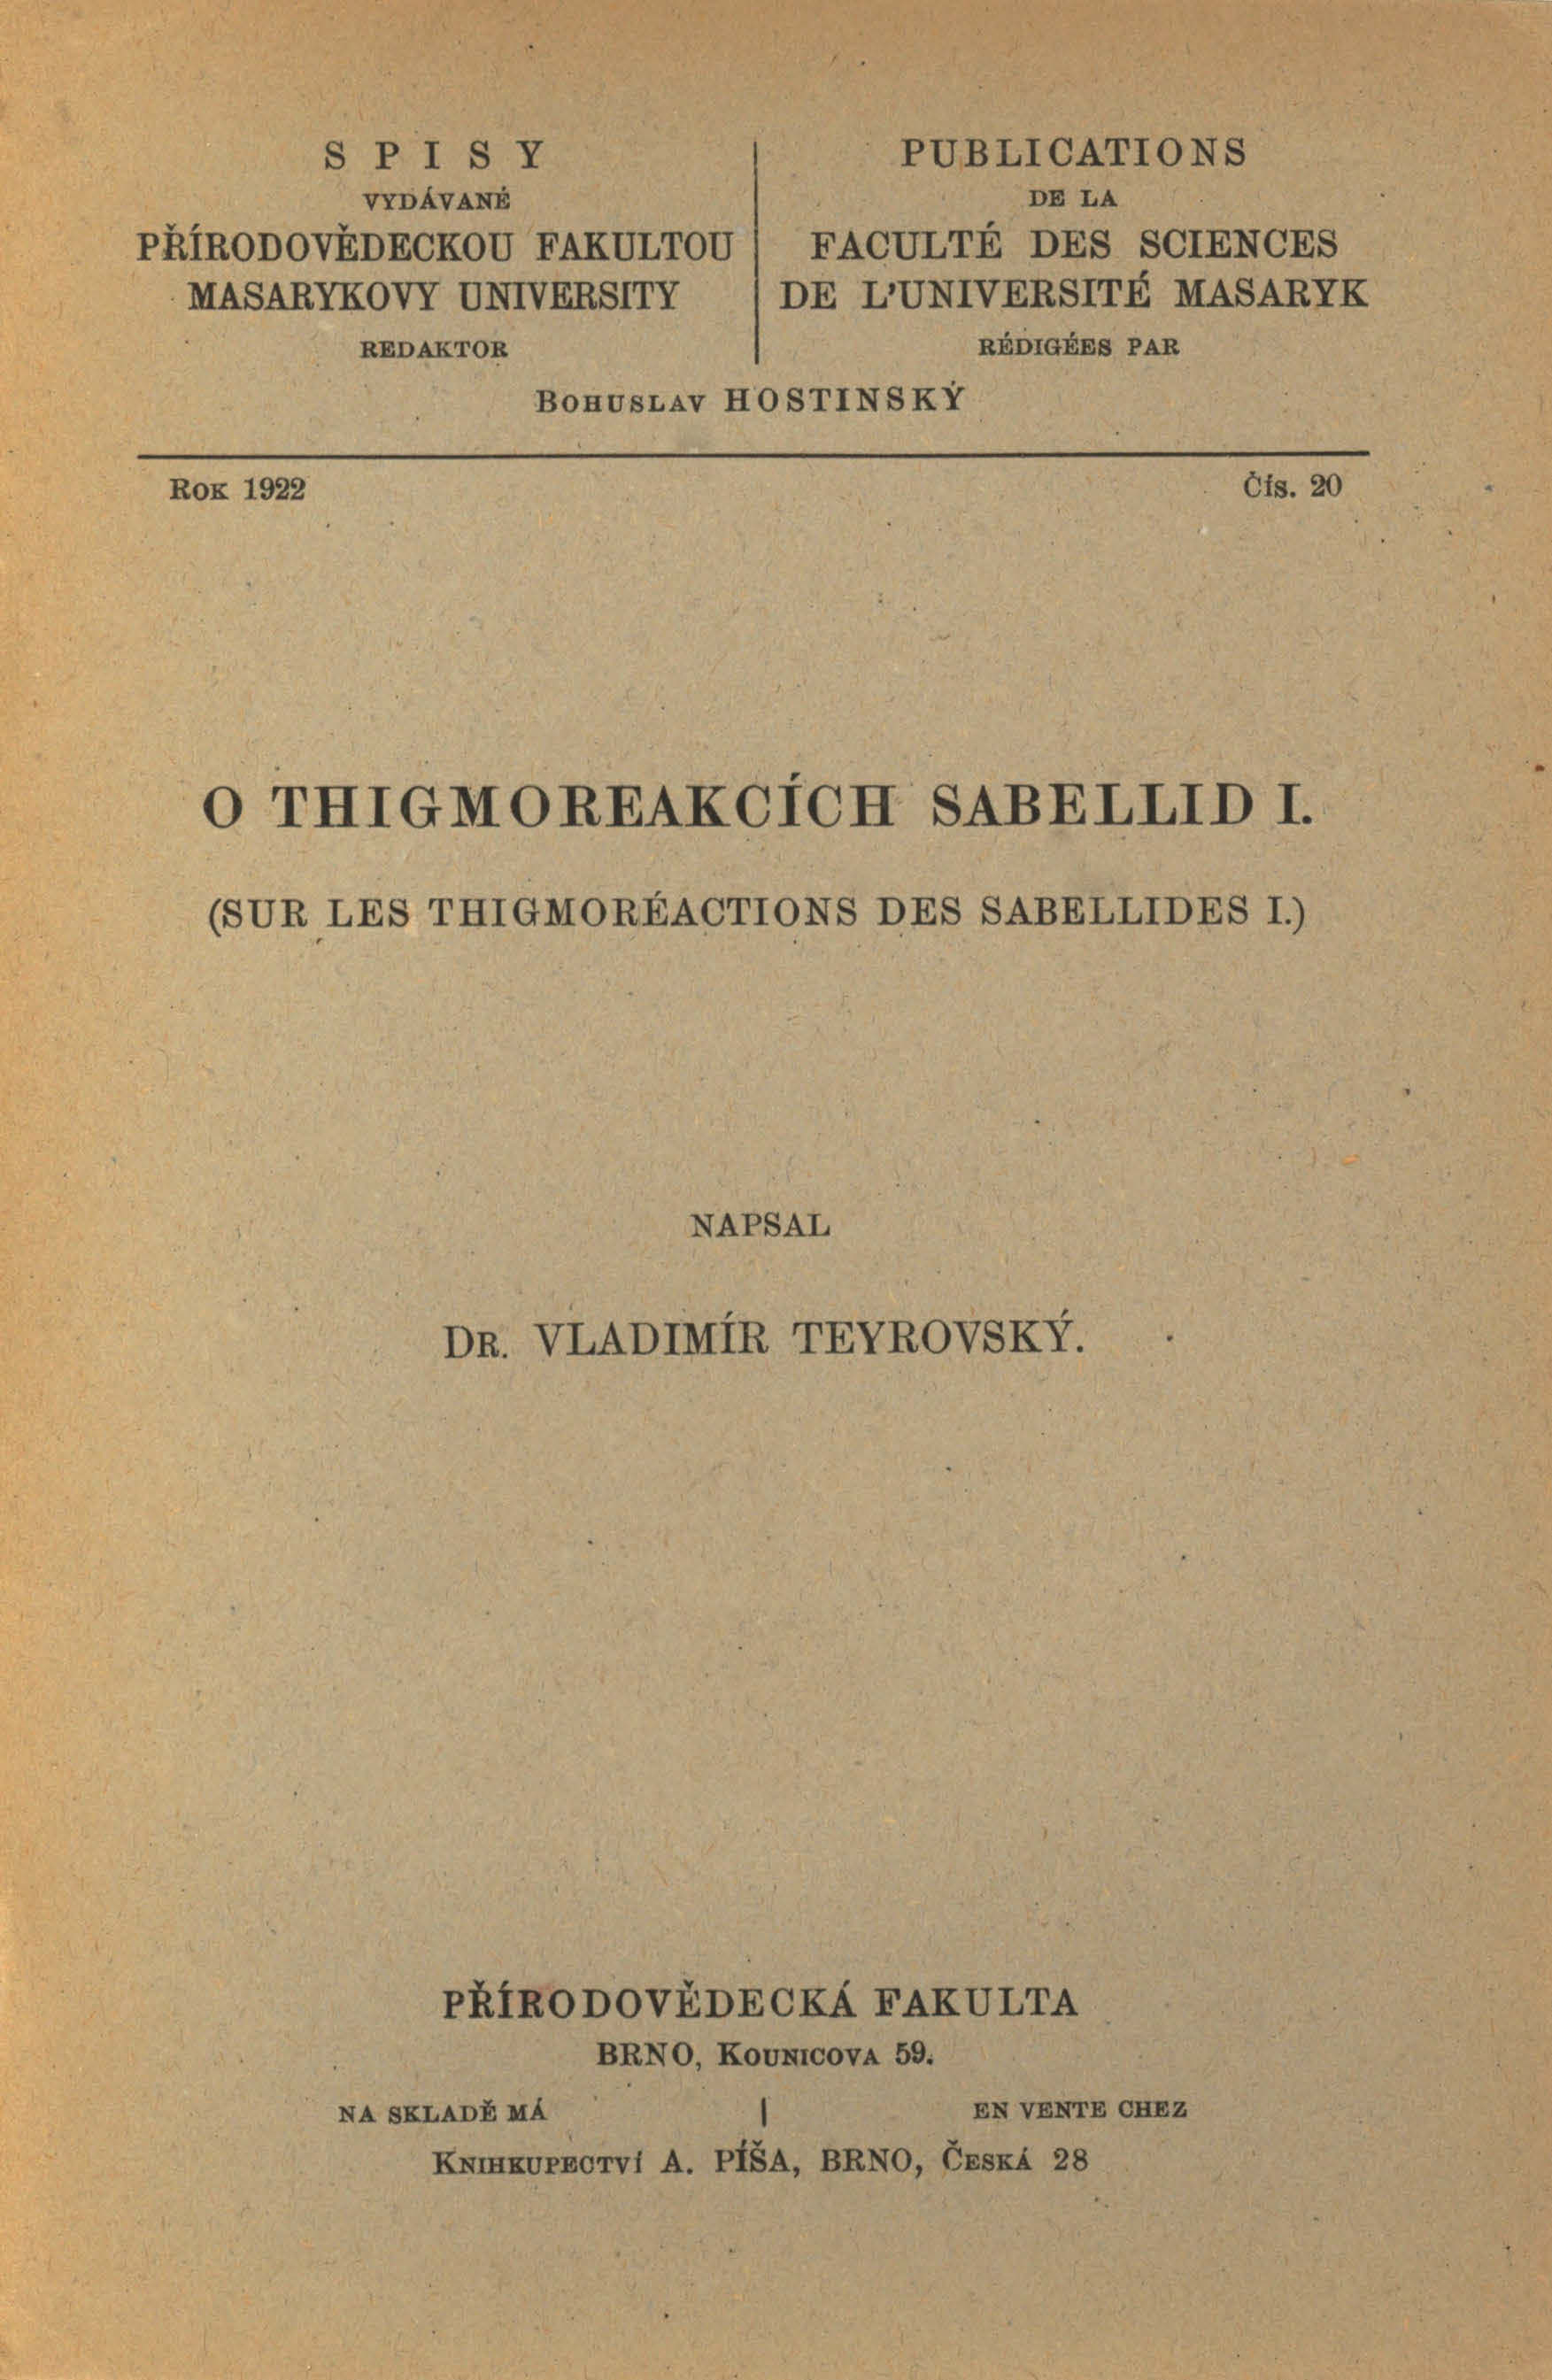 Obálka pro O thigmoreakcích sabellid I.